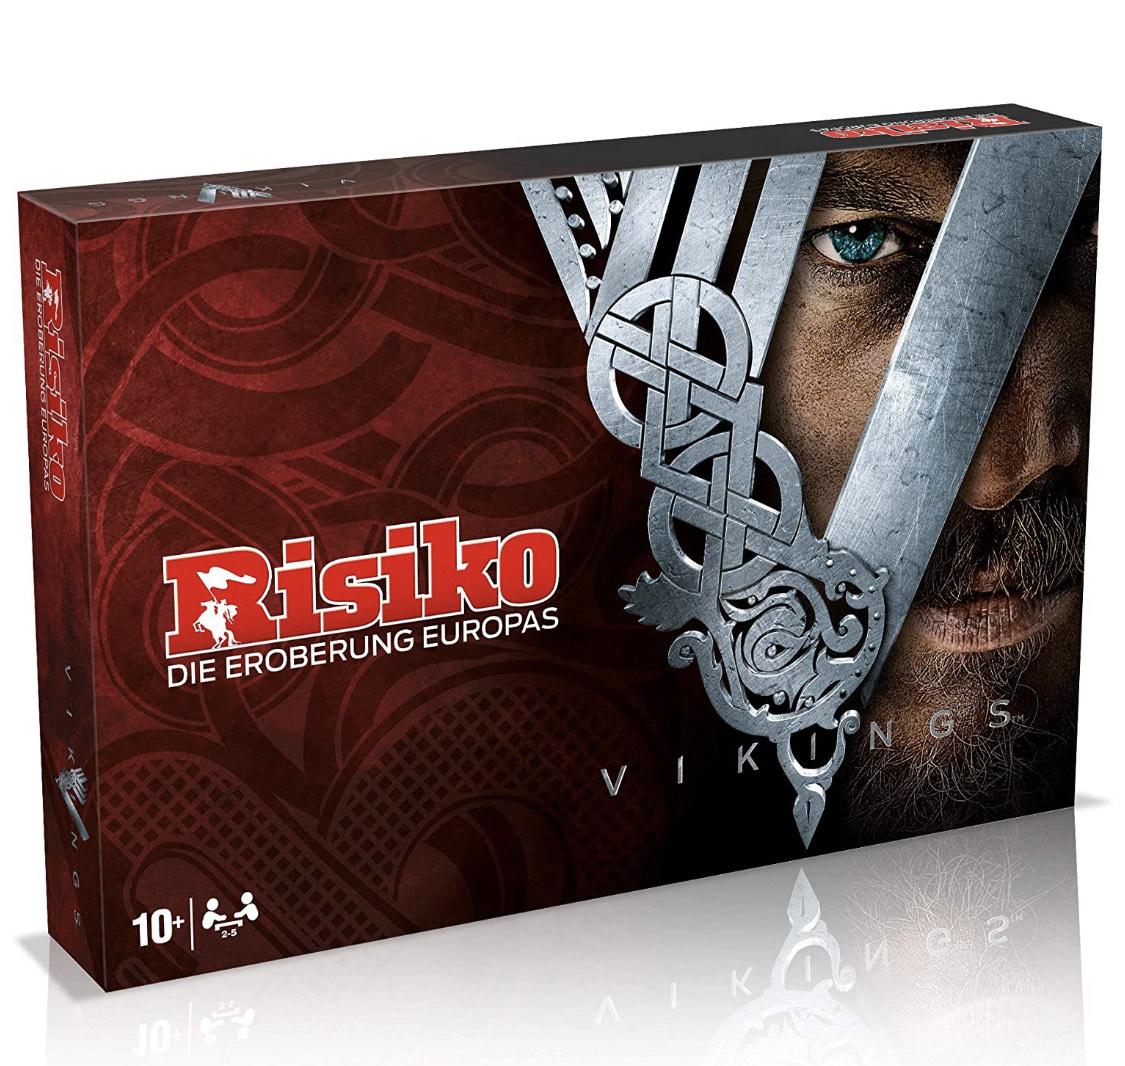 Brettspiel Risiko Vikings [Amazon Prime]